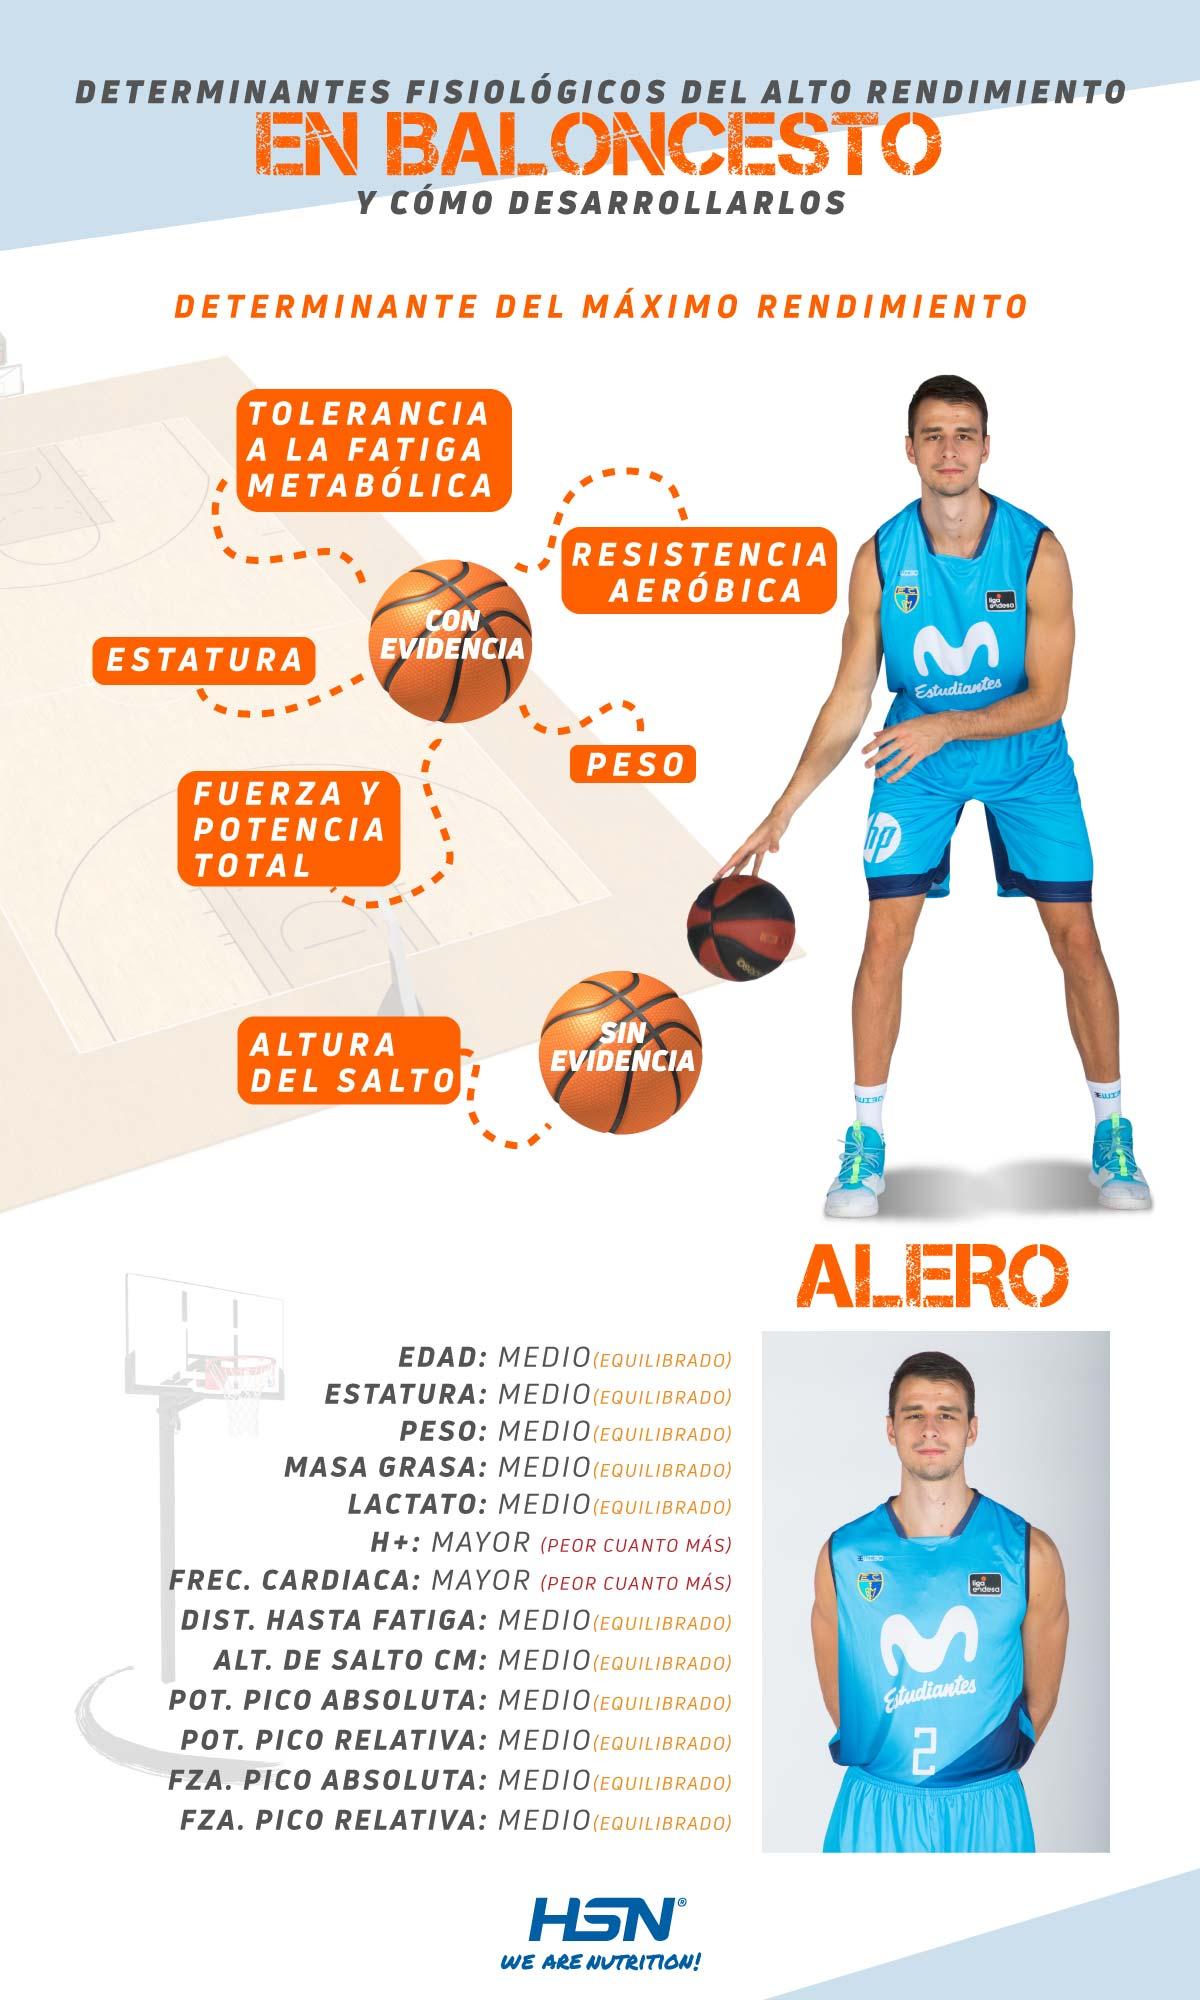 Determinantes fisiológicas Aleros Baloncesto